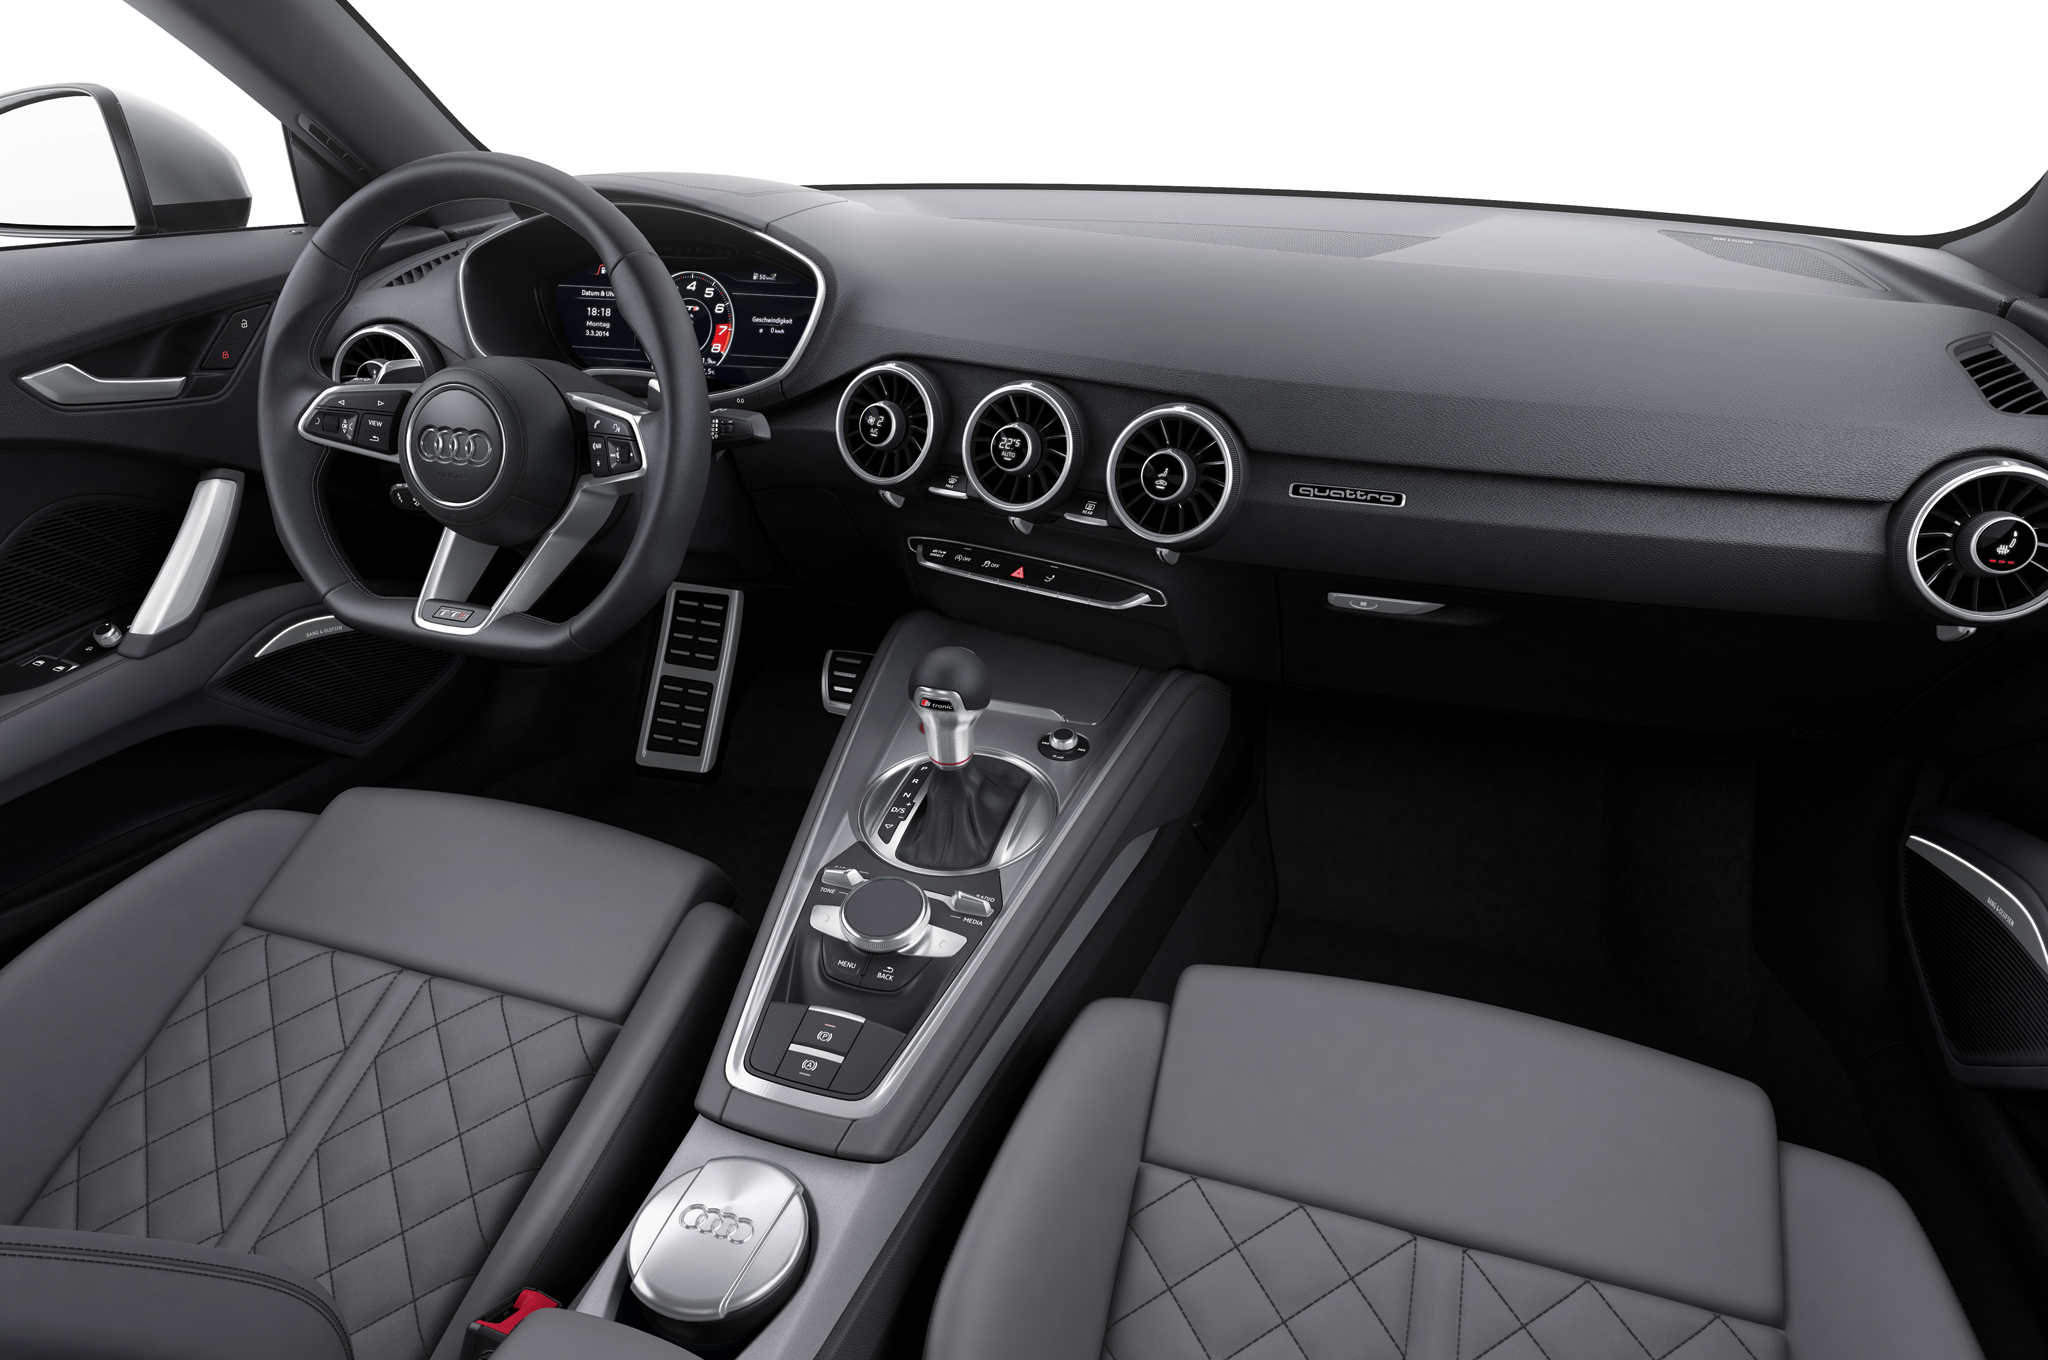 2016 Audi Tts Interior Dashboard (View 32 of 41)